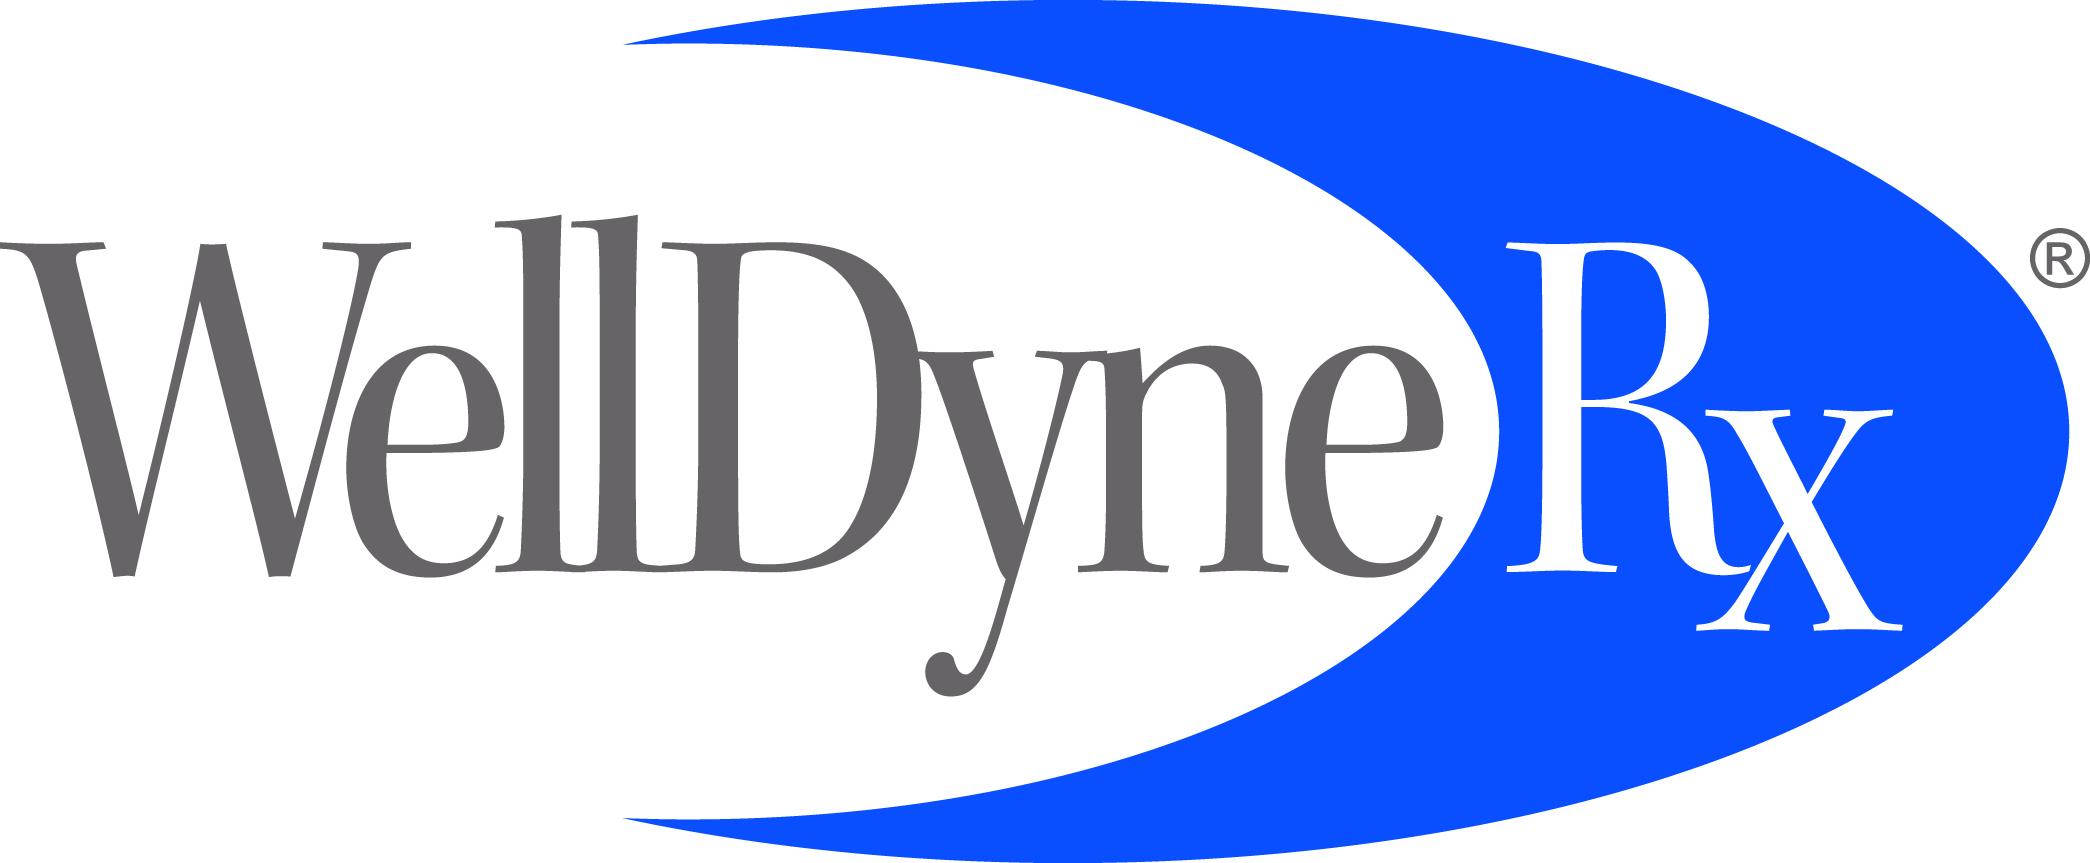 WellDyne%20Rx